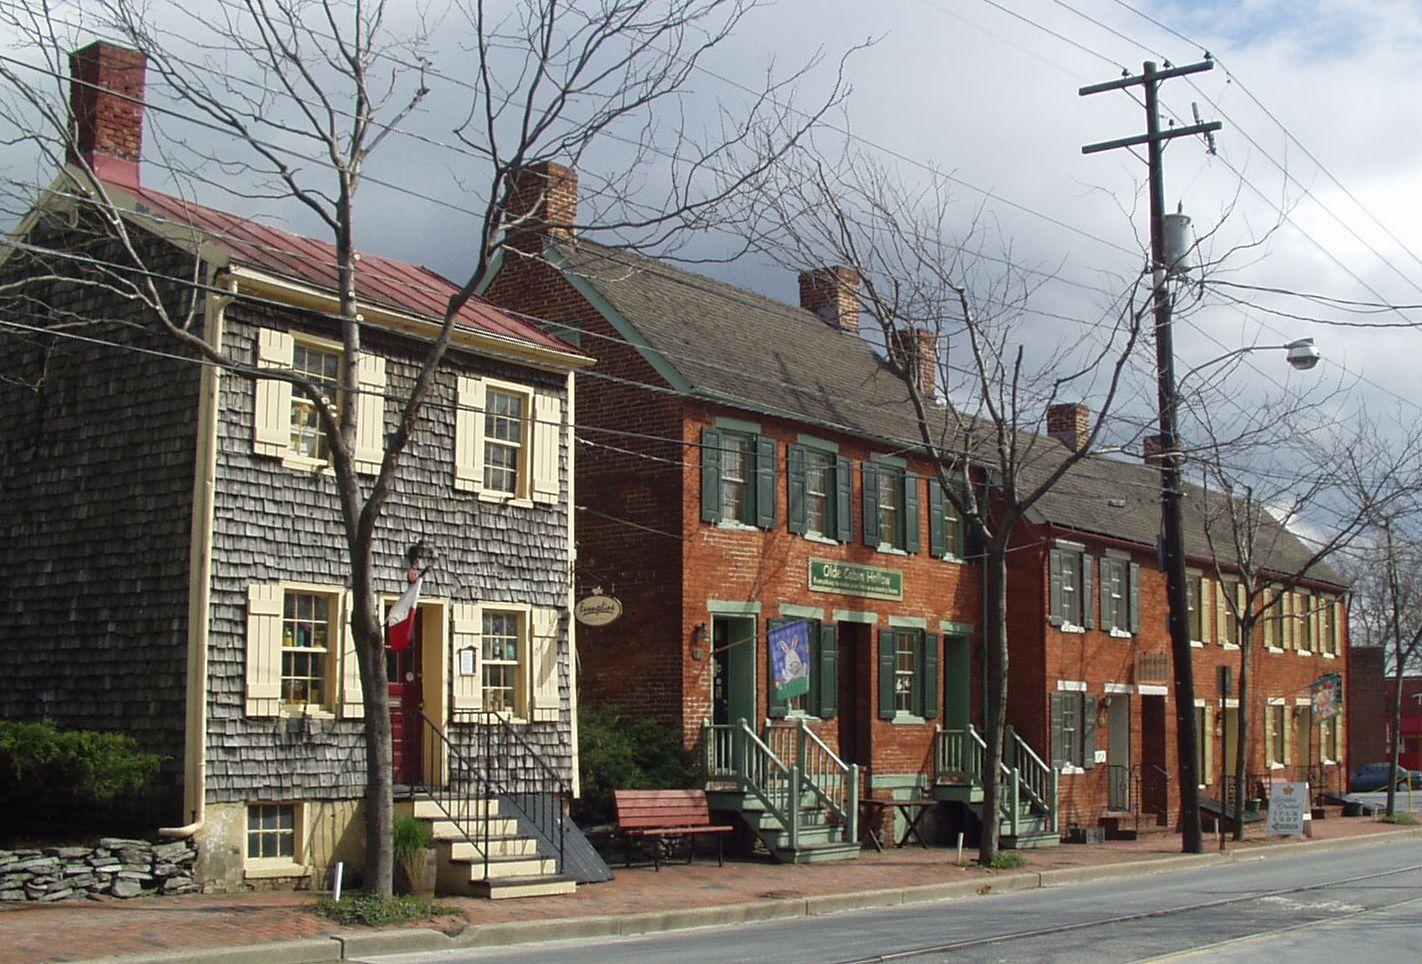 Shab Row, Frederick, Maryland